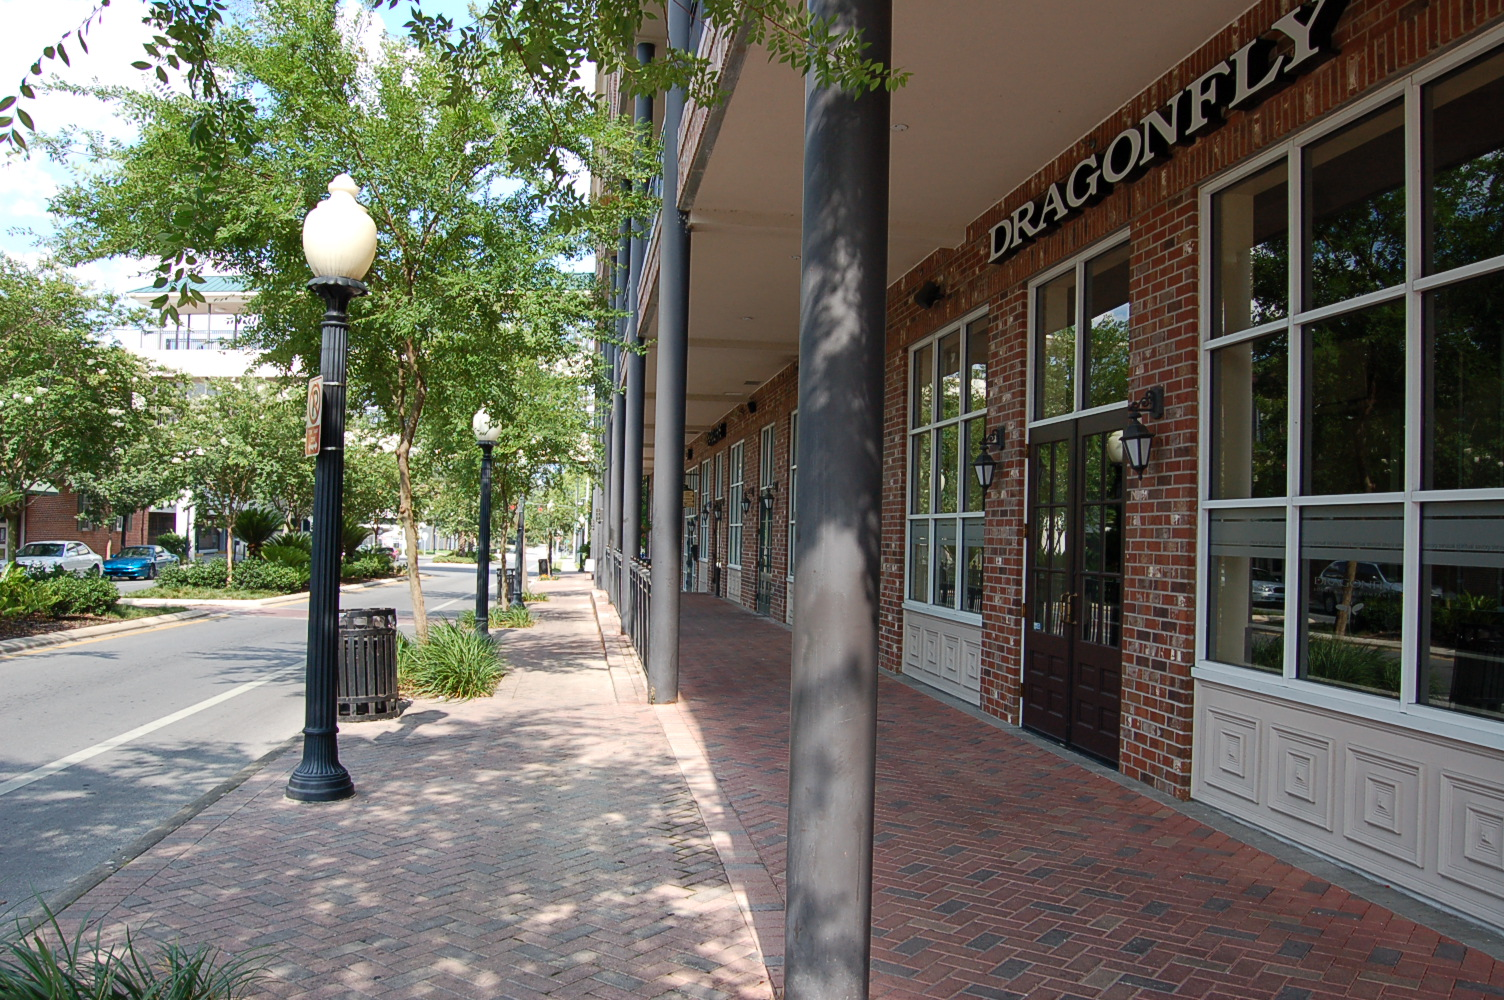 Union Street Station: Real Estate Market Update